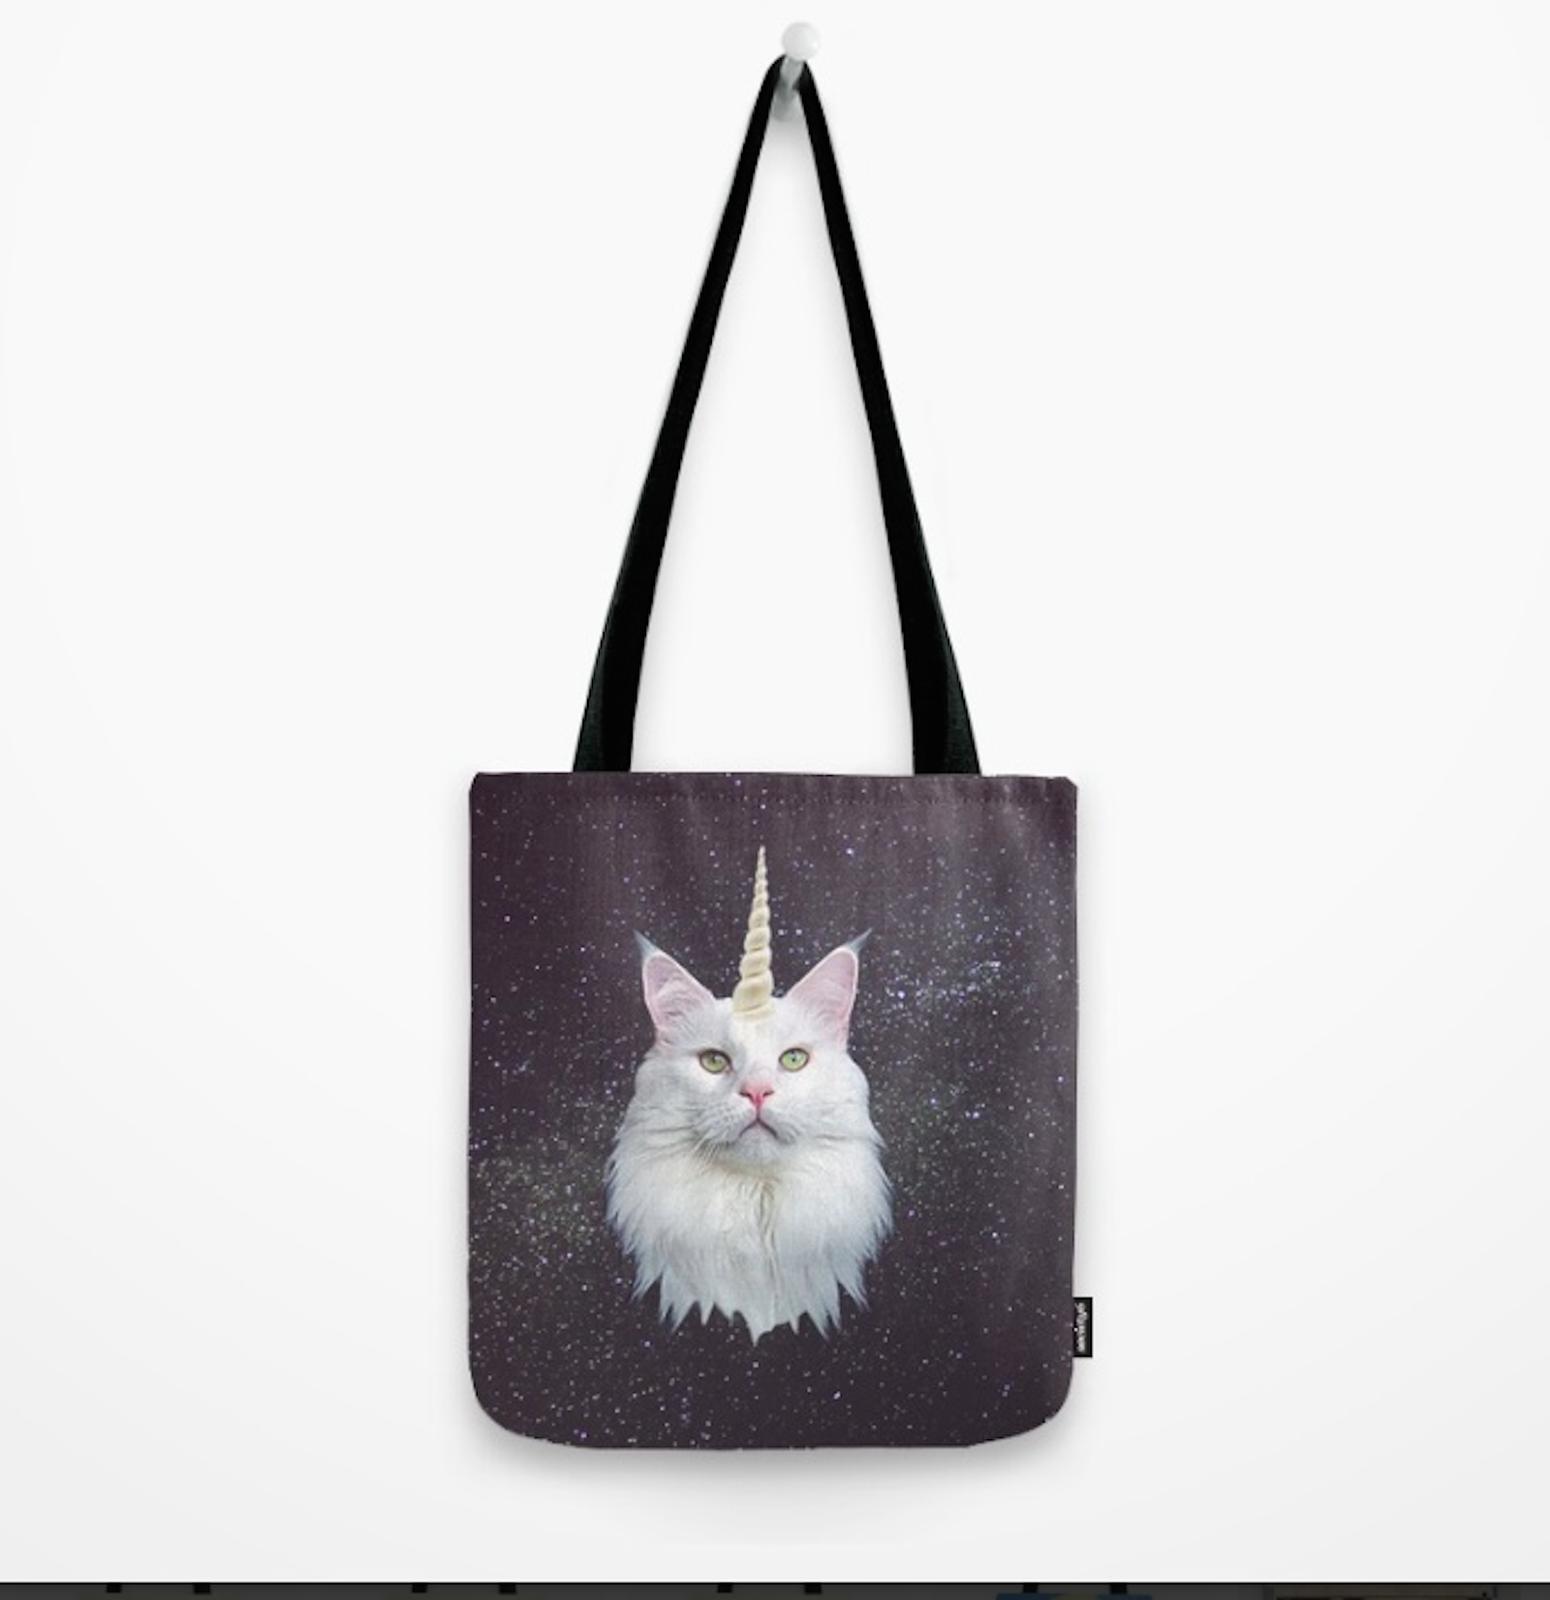 31.58$  Watch here - http://viogz.justgood.pw/vig/item.php?t=dqevgm22644 - Original Arts Shopping Bag CatLover Durable Hand sewn Poly Poplin Cat-icorn Tote 31.58$